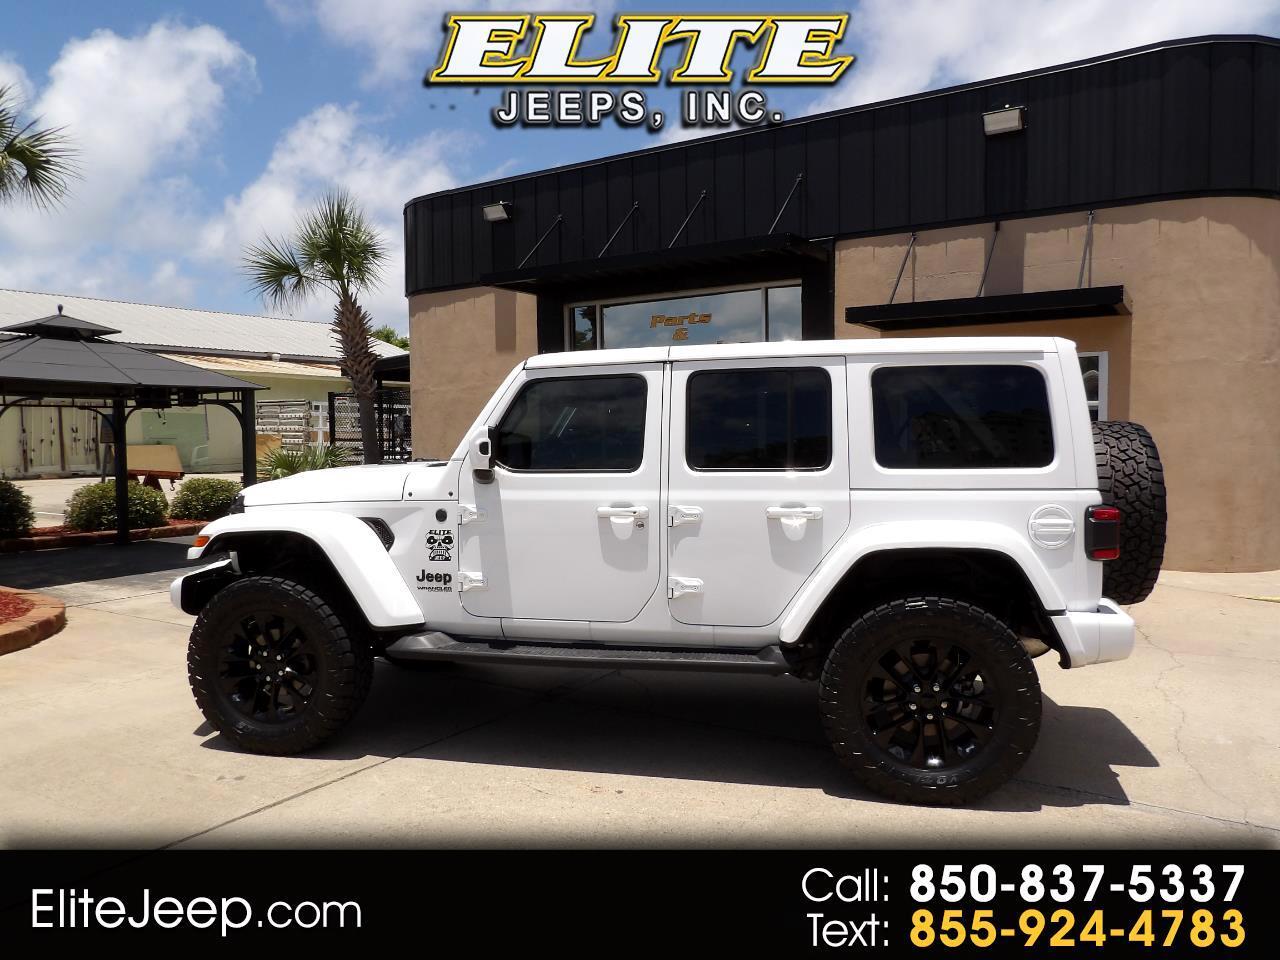 Jeep Wrangler Unlimited Sahara High Altitude 4x4 2021